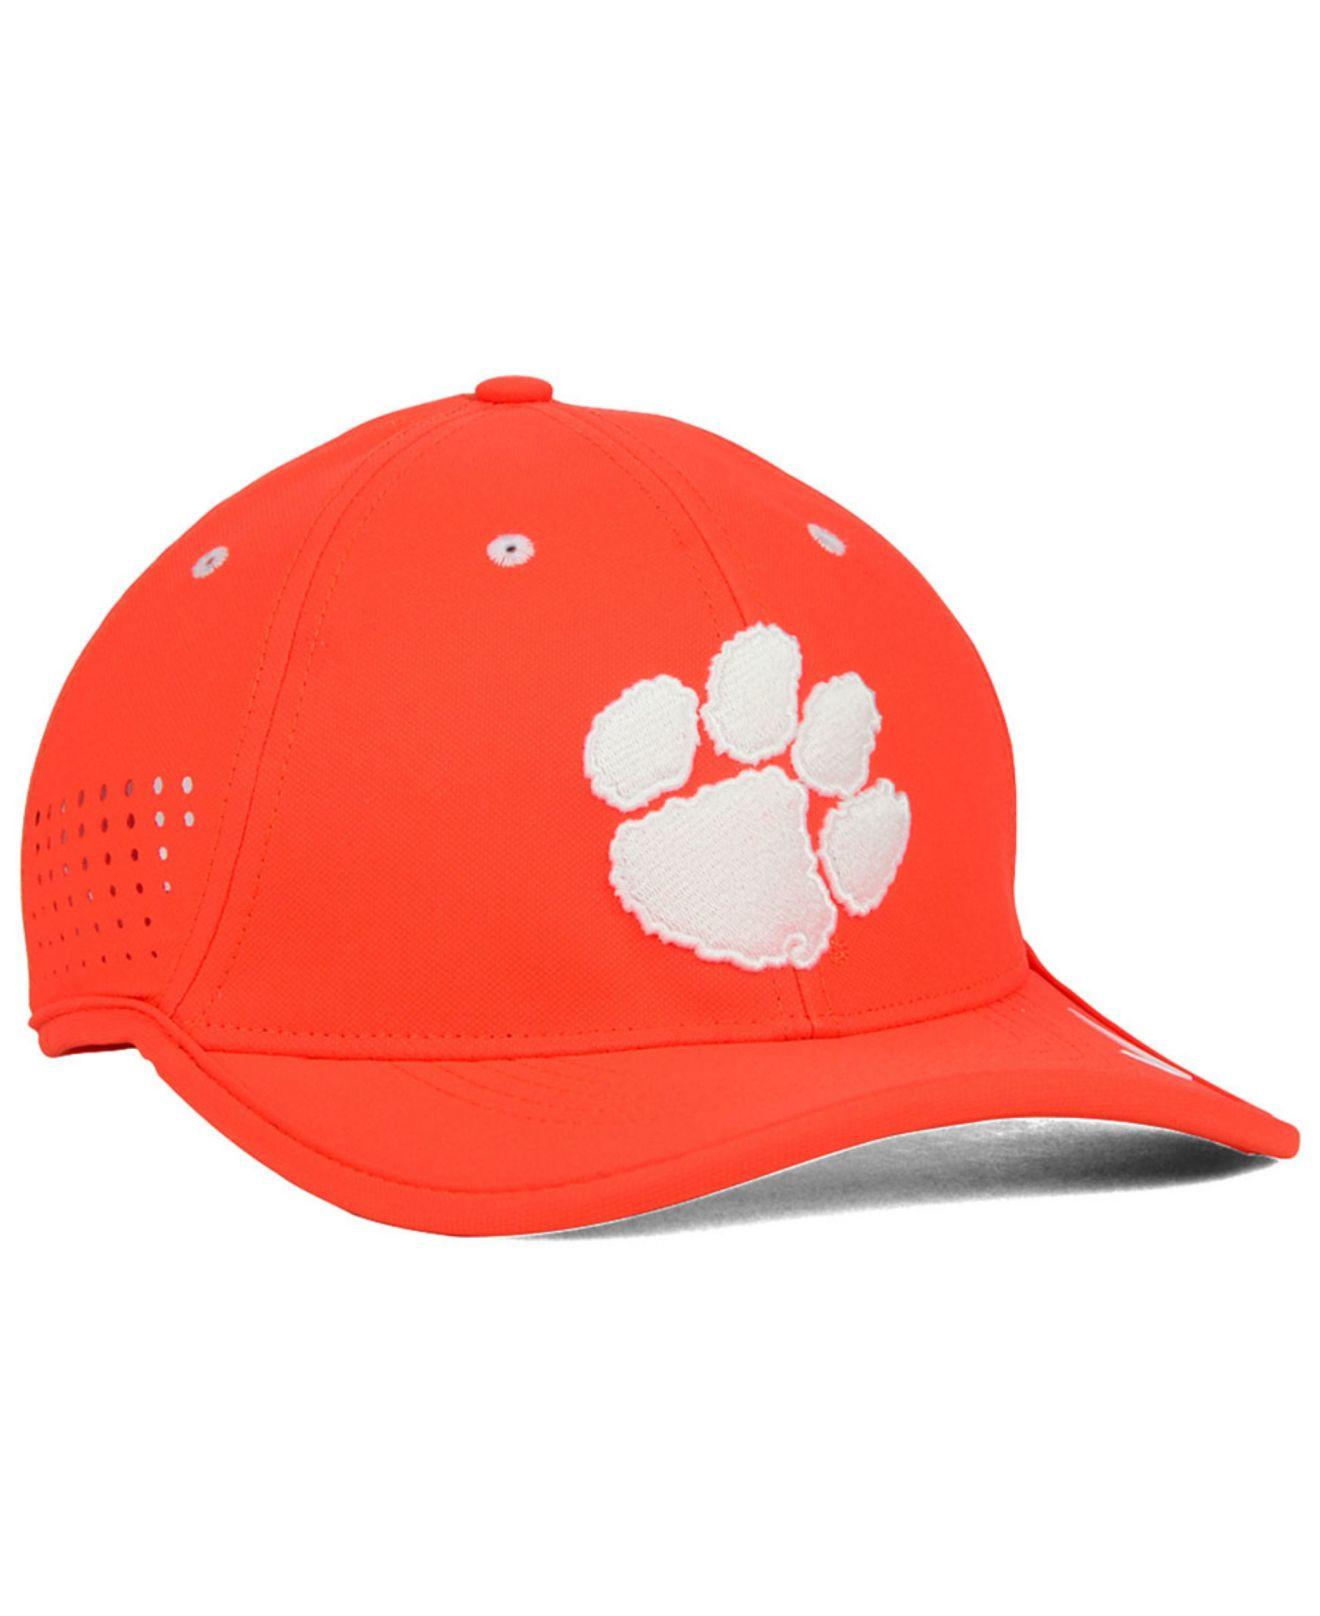 fda0679c888 ... performance adjustable hat 07507 85b07  cheap lyst nike clemson tigers  dri fit coaches cap in orange for men bbca9 3f35f